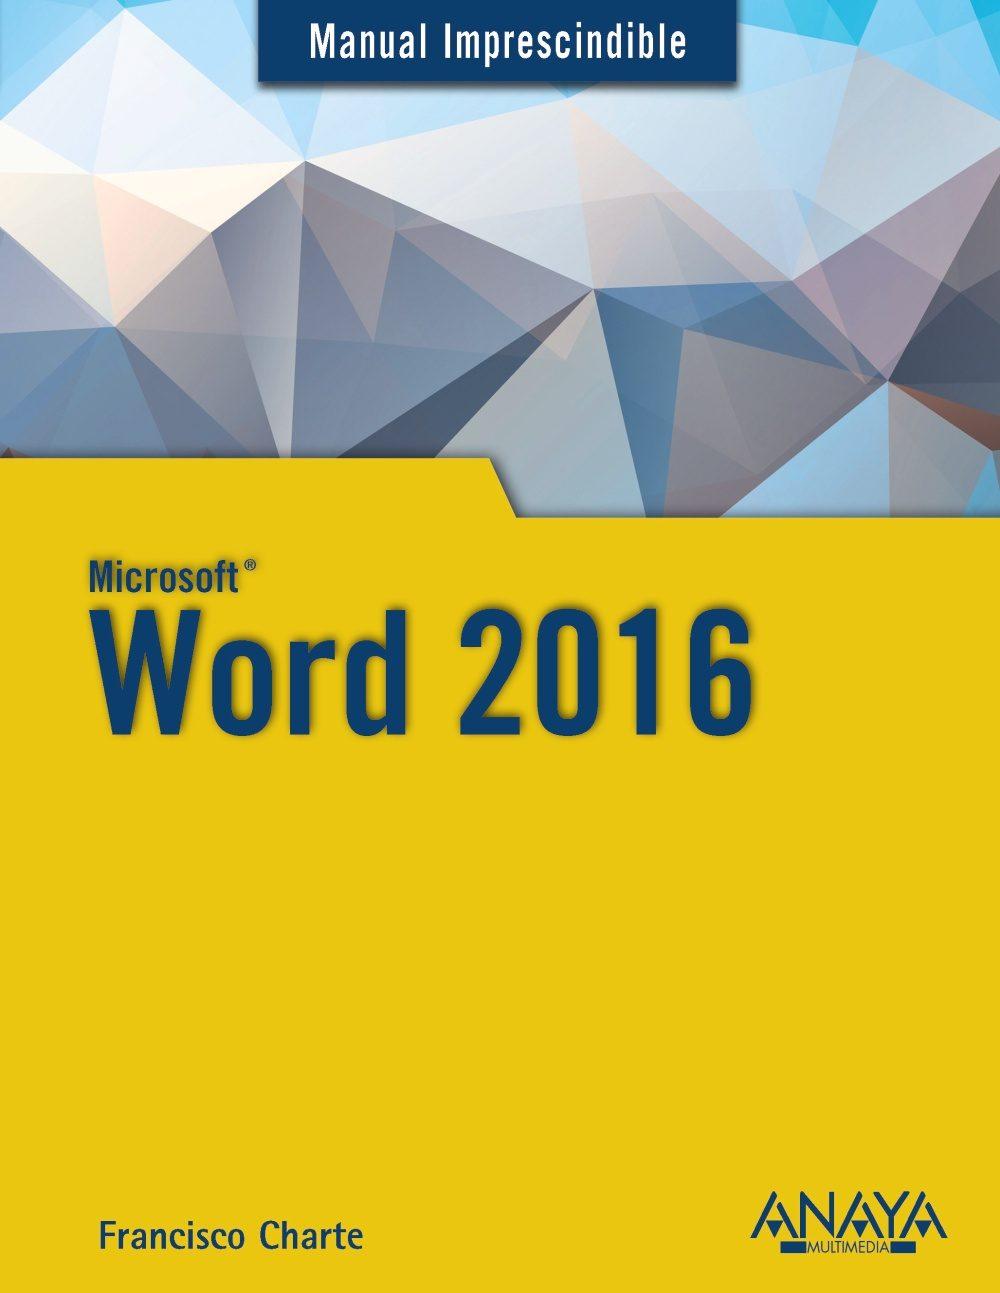 Word 2016 (manual Imprescindible) por Francisco Chartre